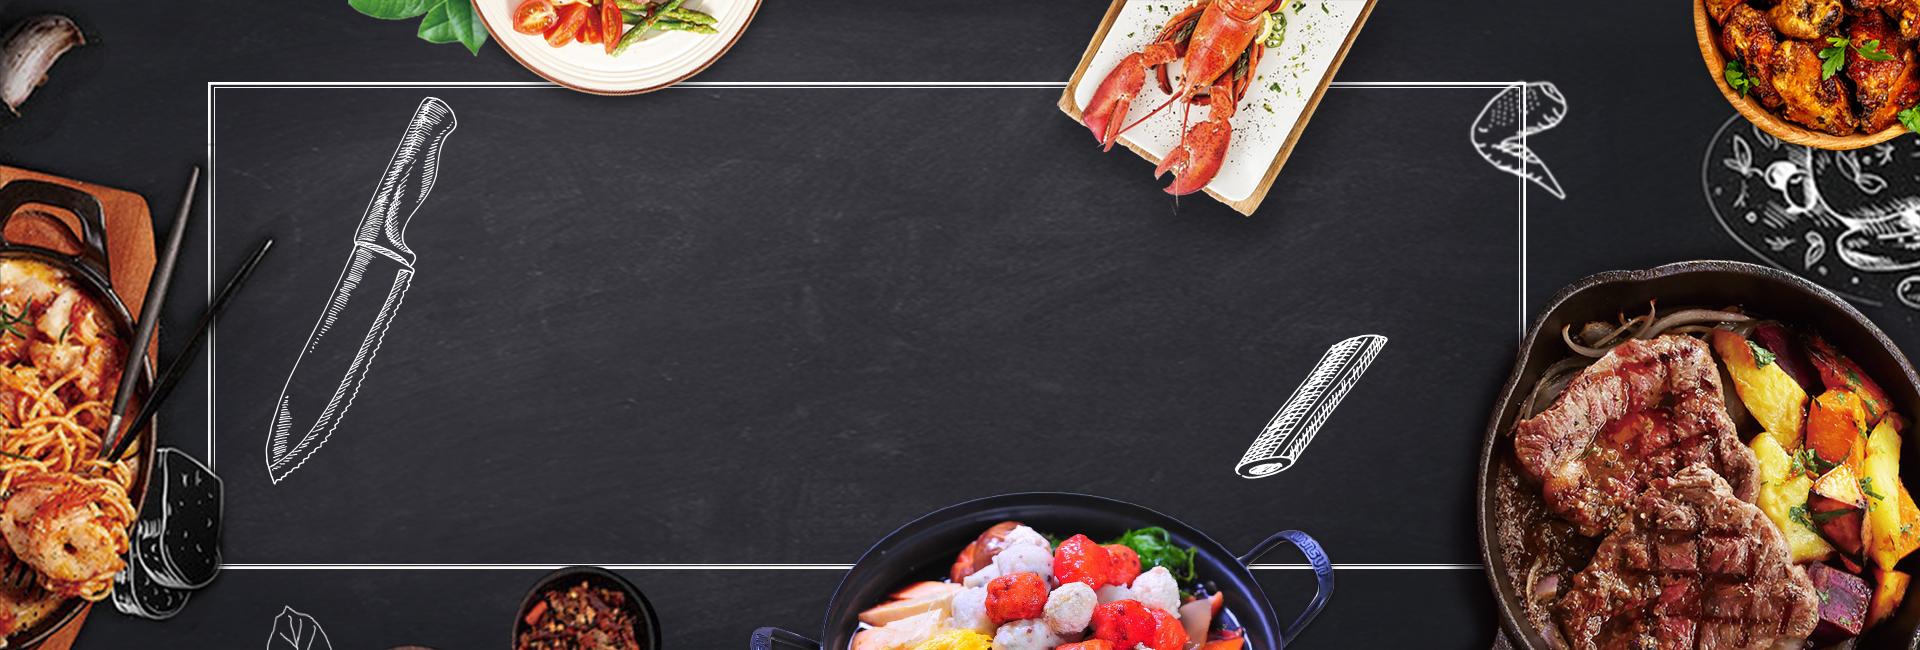 Fondo De Comida Mexicana: West Steak Geometric Black Hand Painted Background, Food